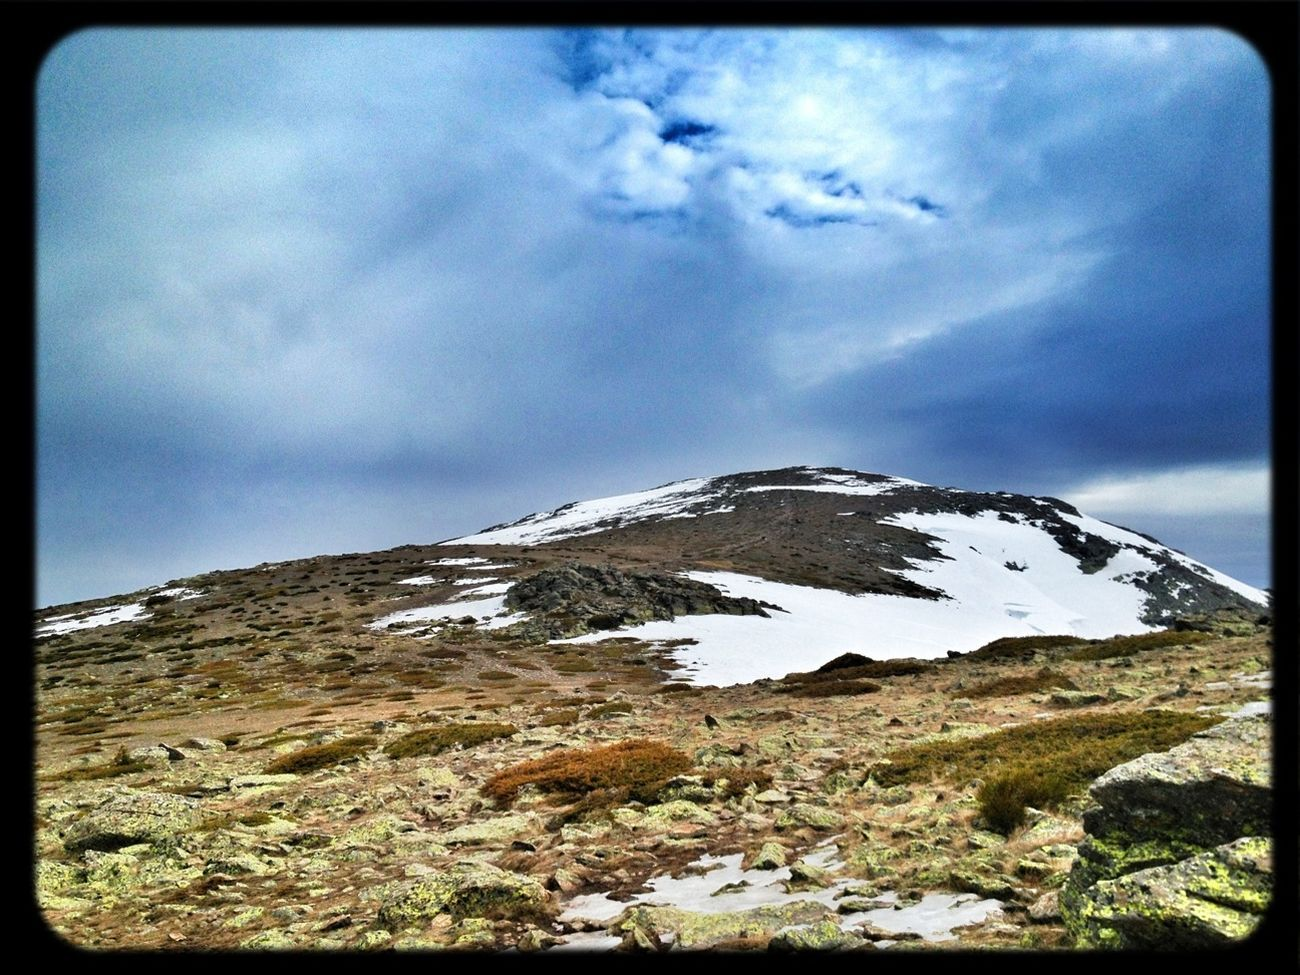 Última Subida A Peñalara De La Temporada Con Los Esquíes (a La Espalda) #esquídemontaña #skimo #skimountaineering #dynafit #amanecer #sunrise #mountain #ilovemountains #training #gasss #DynaTour #Ascent #Regram #skinning #Dynafitting #WIN #sinfiltros